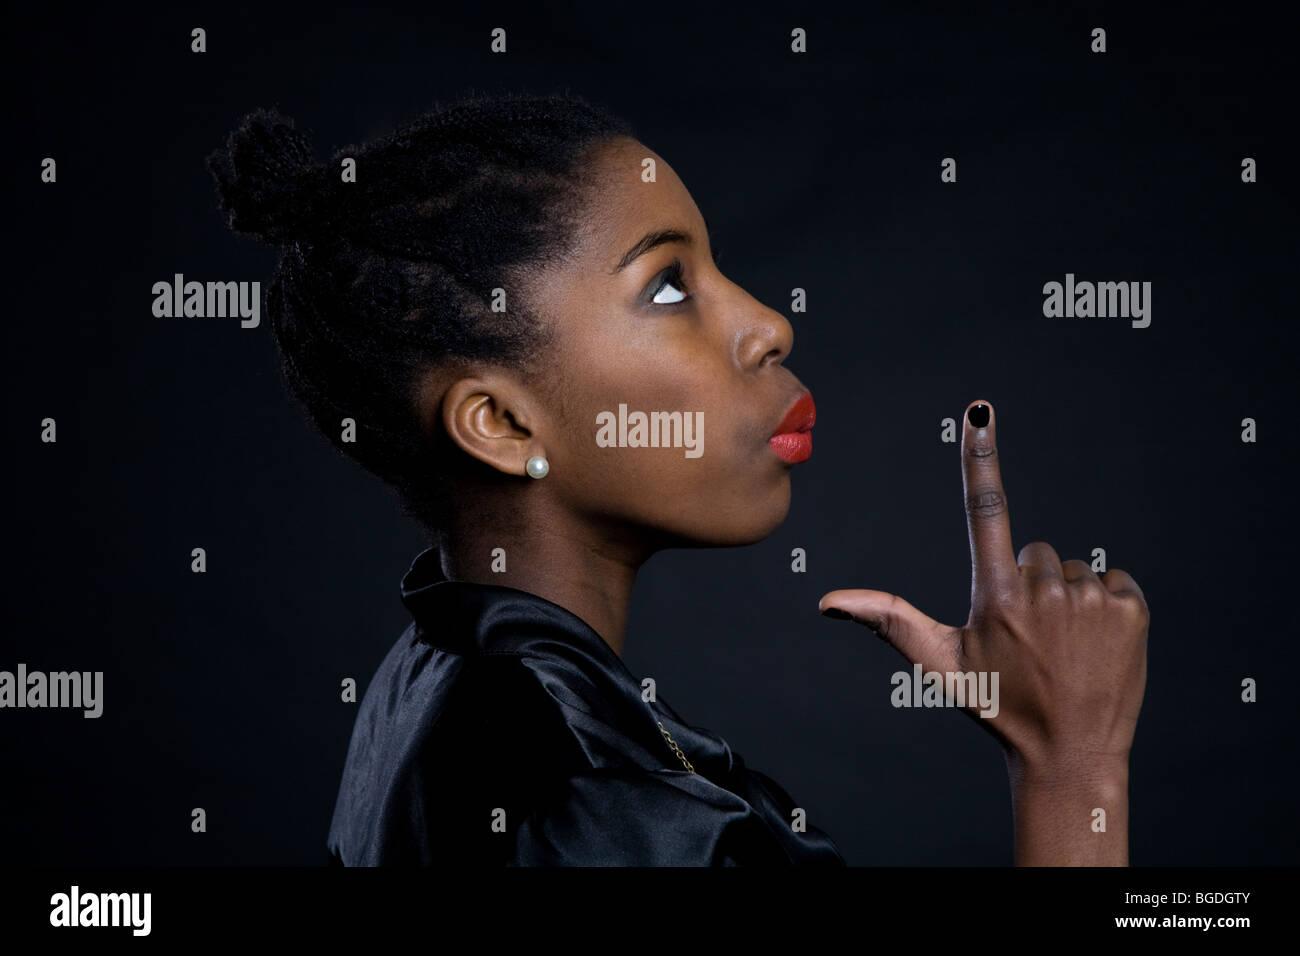 Teenage girl pretending to blow the smoke off a gun. Stock Photo